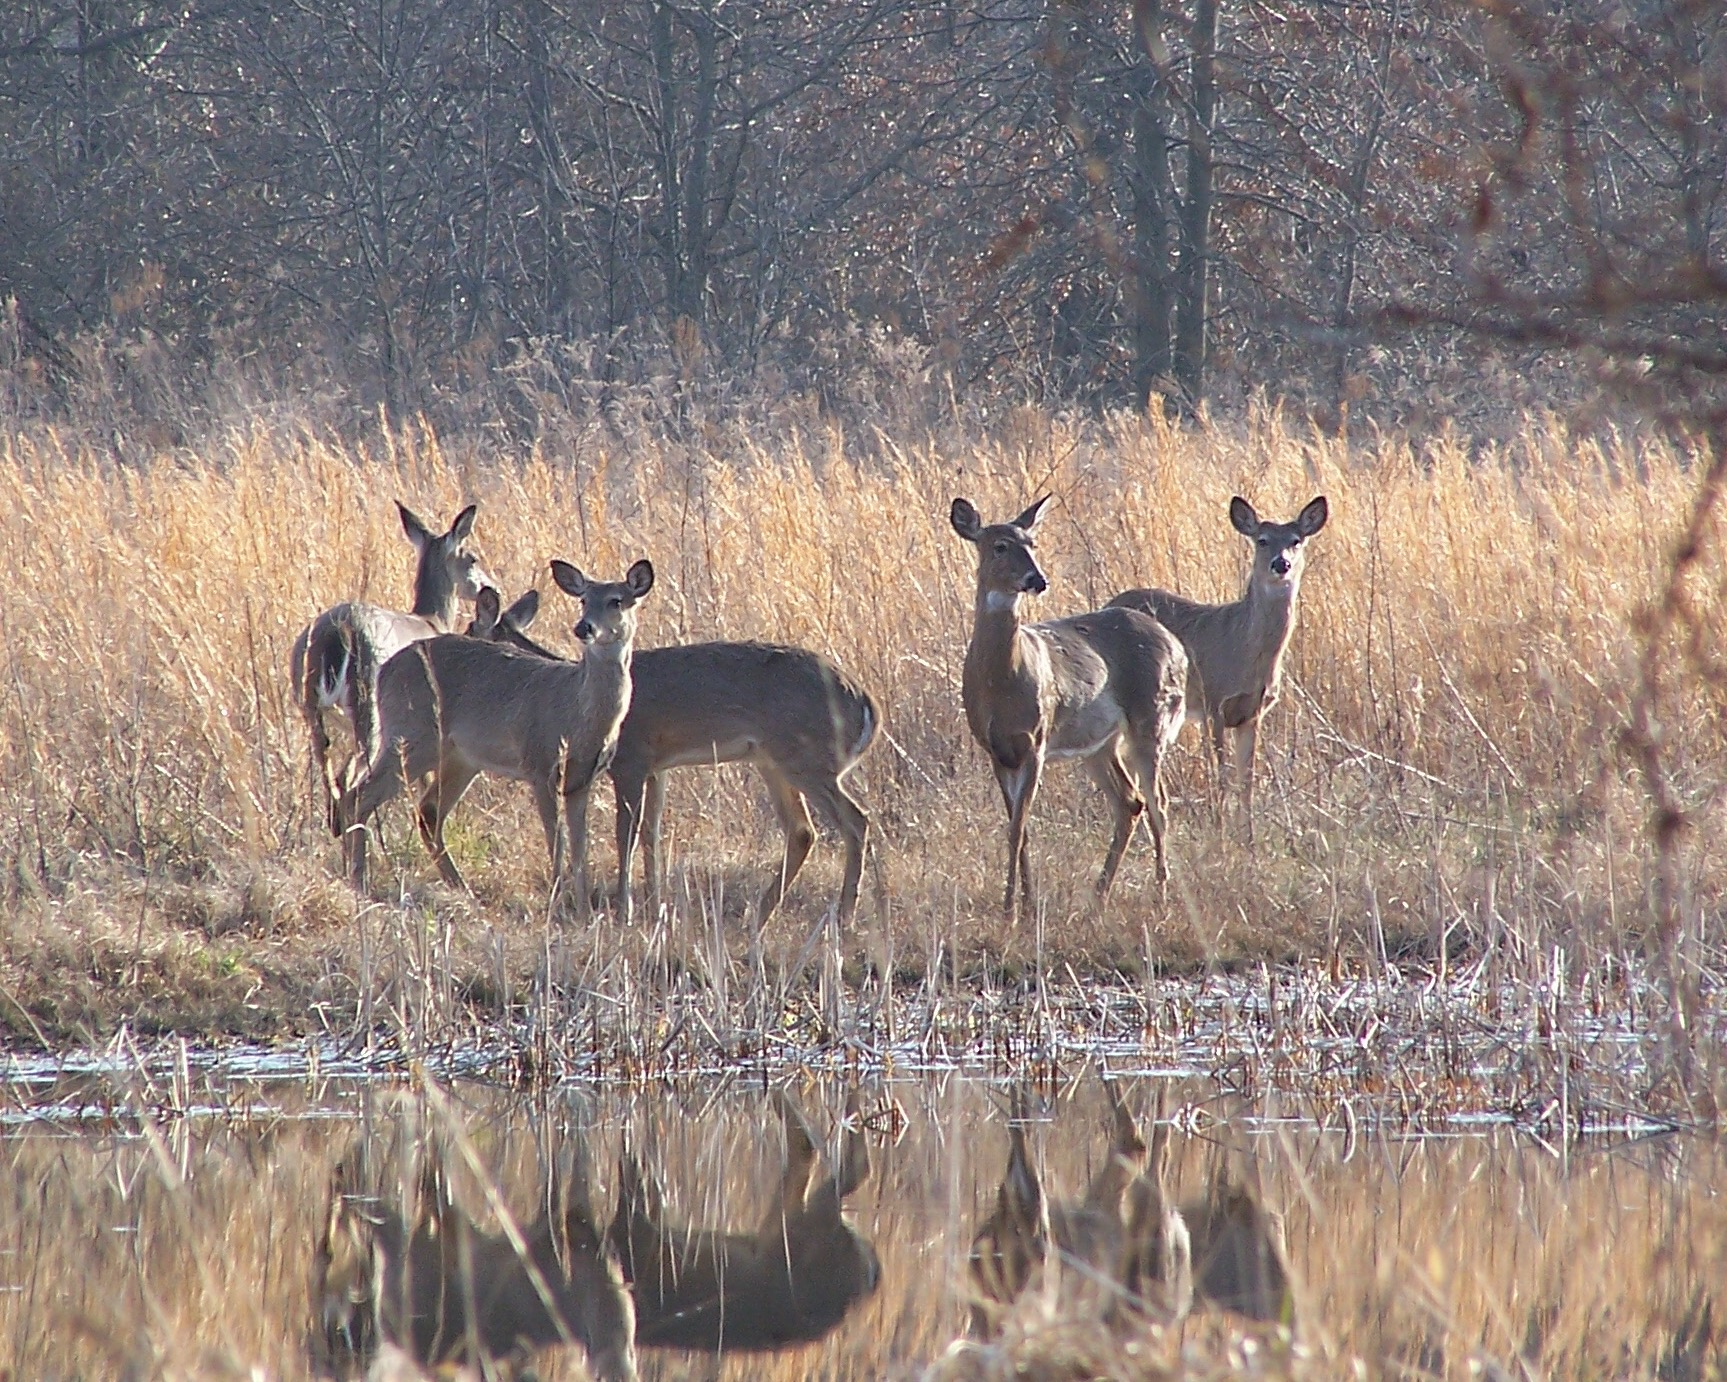 Wetland visitors